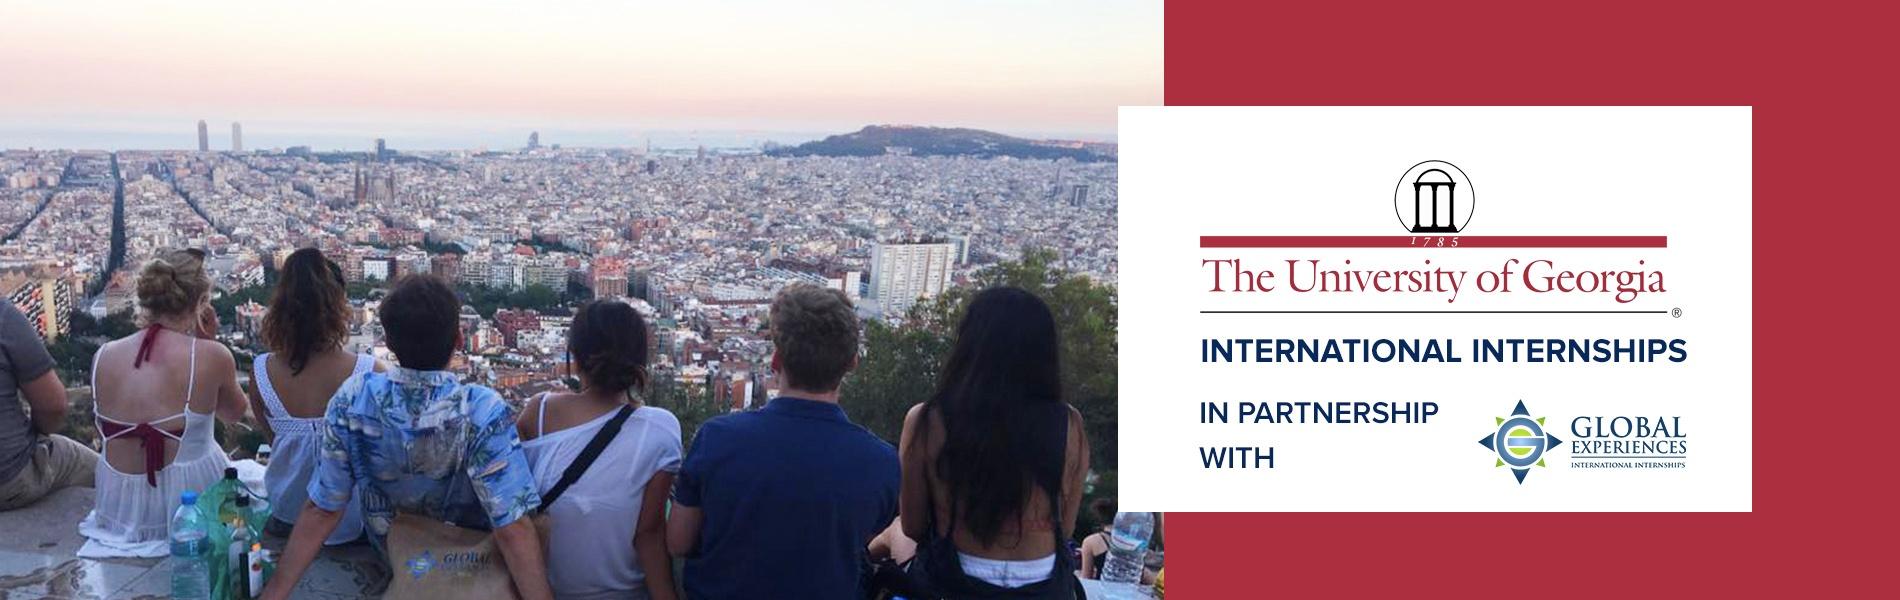 The University of Georgia Intern Abroad